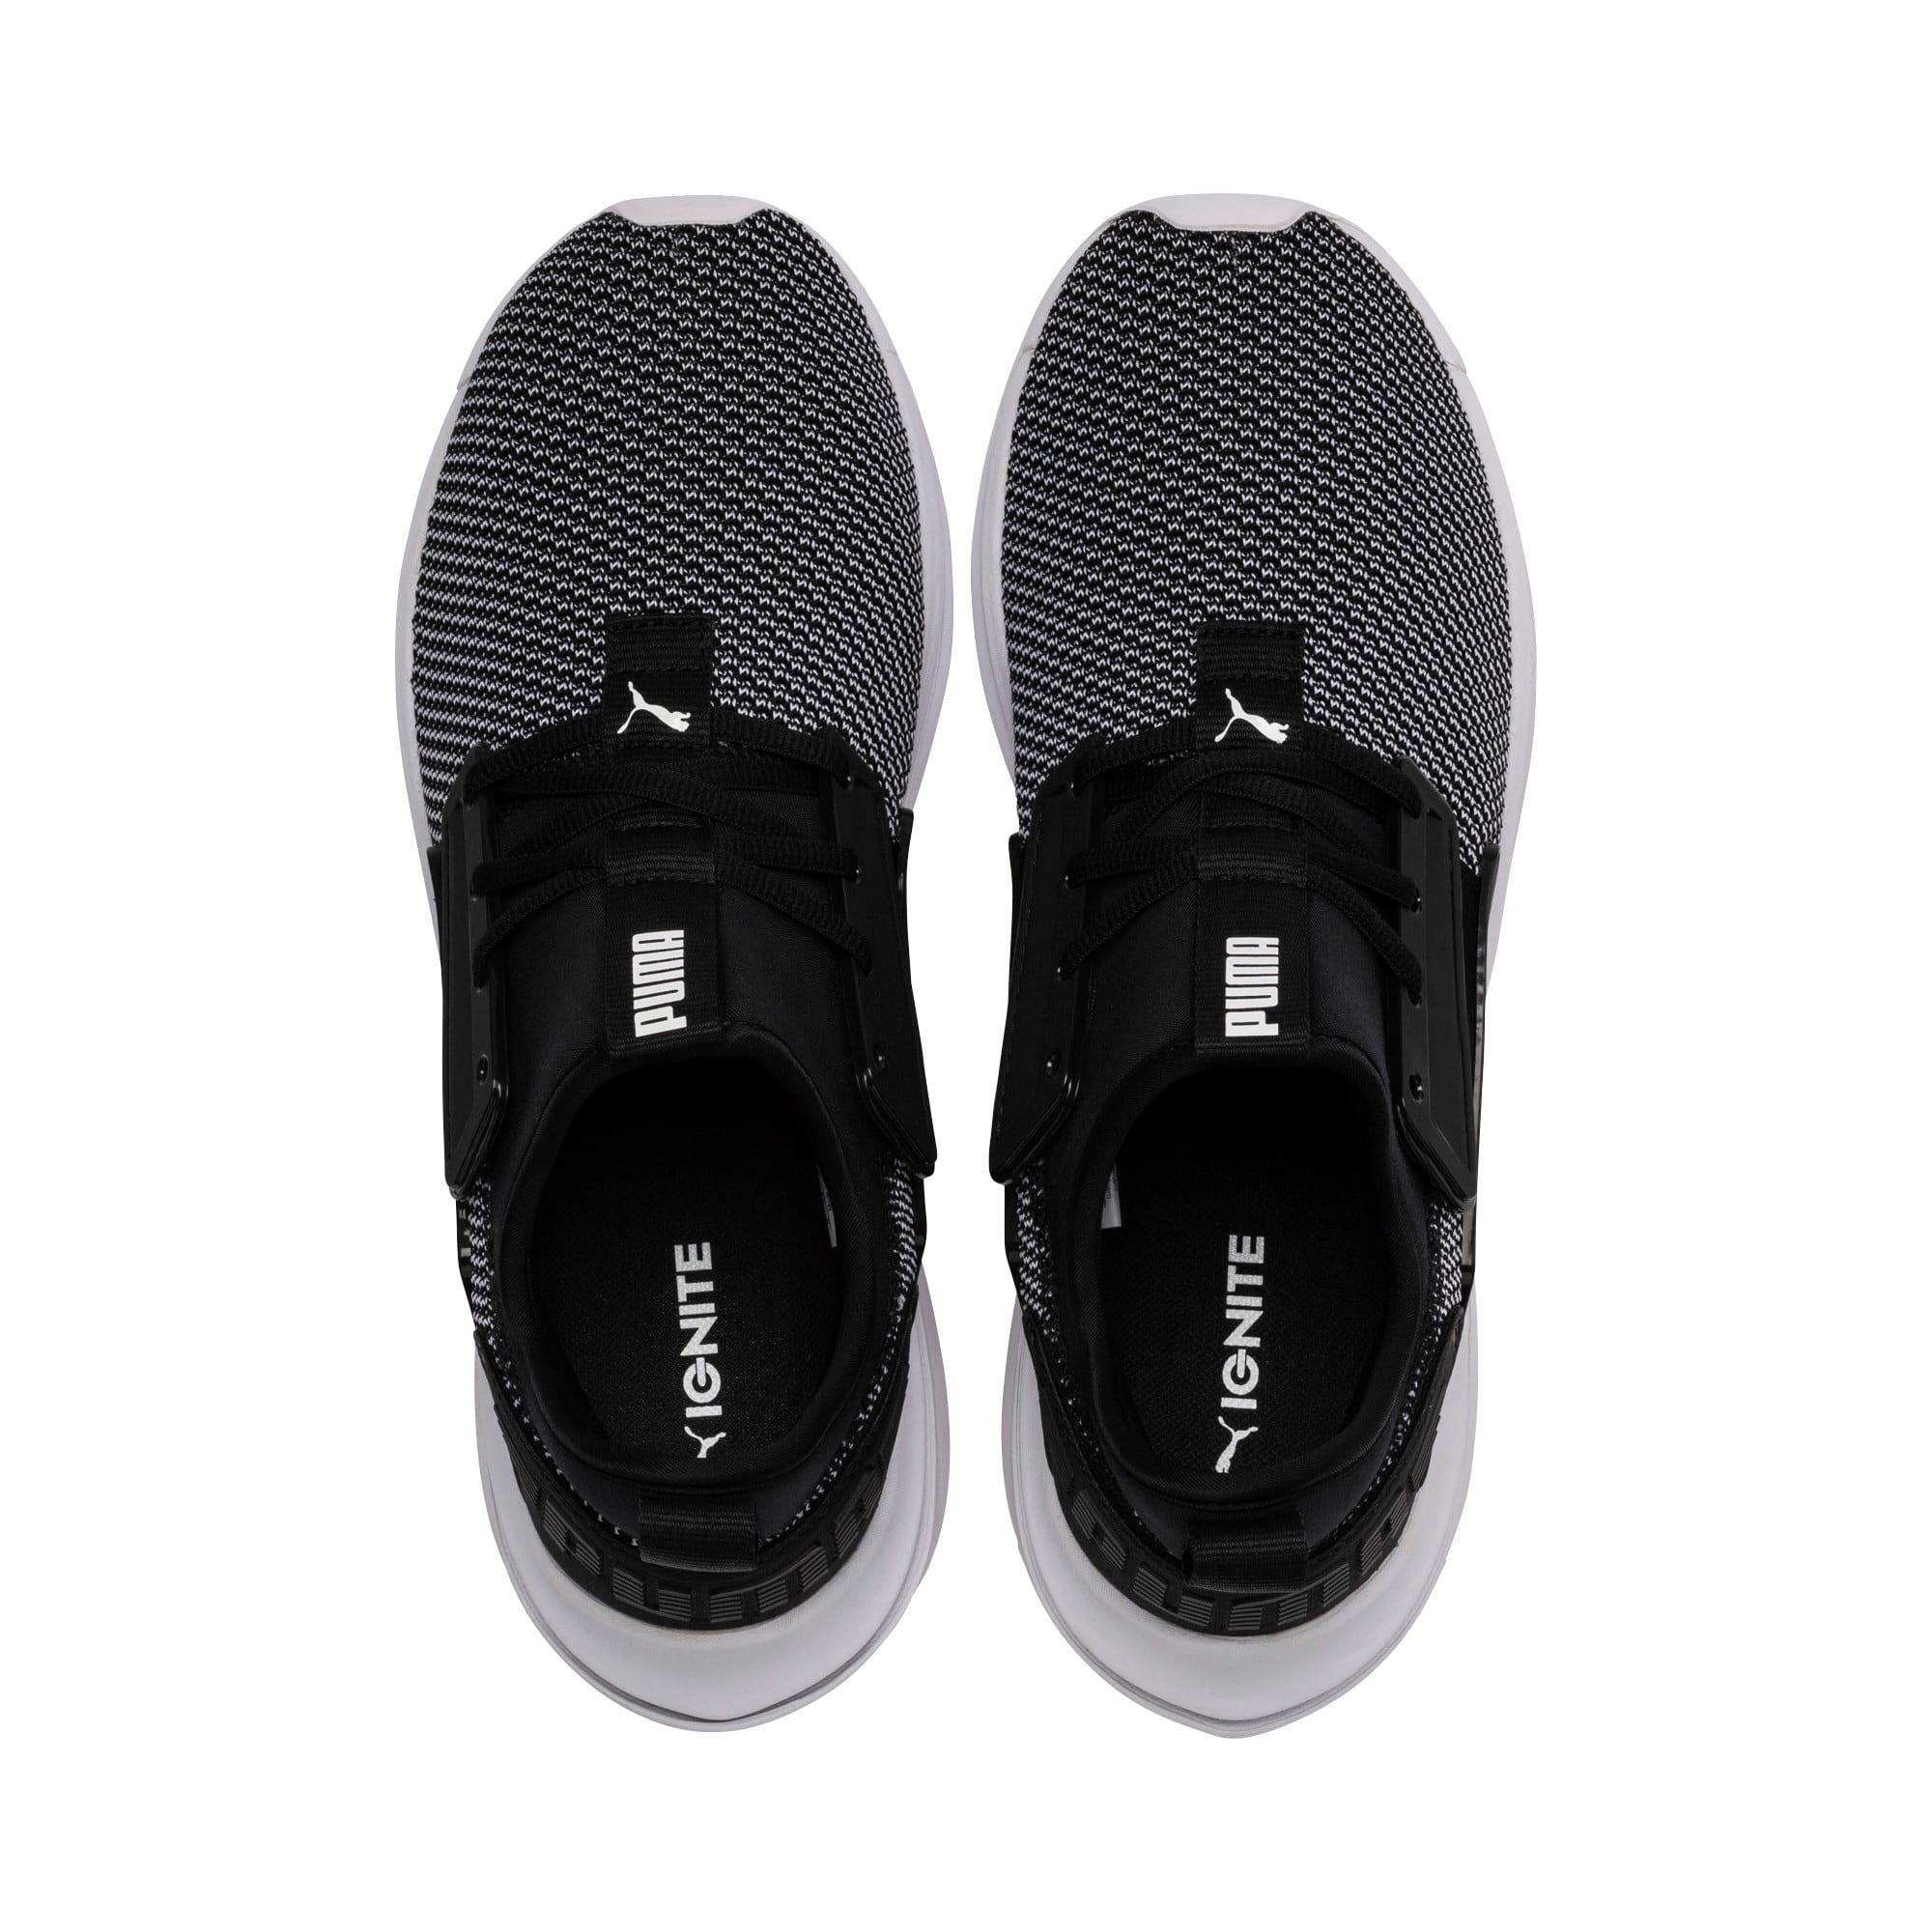 Thumbnail 6 of IGNITE Limitless SR New School Sneakers, Puma Black-Puma White, medium